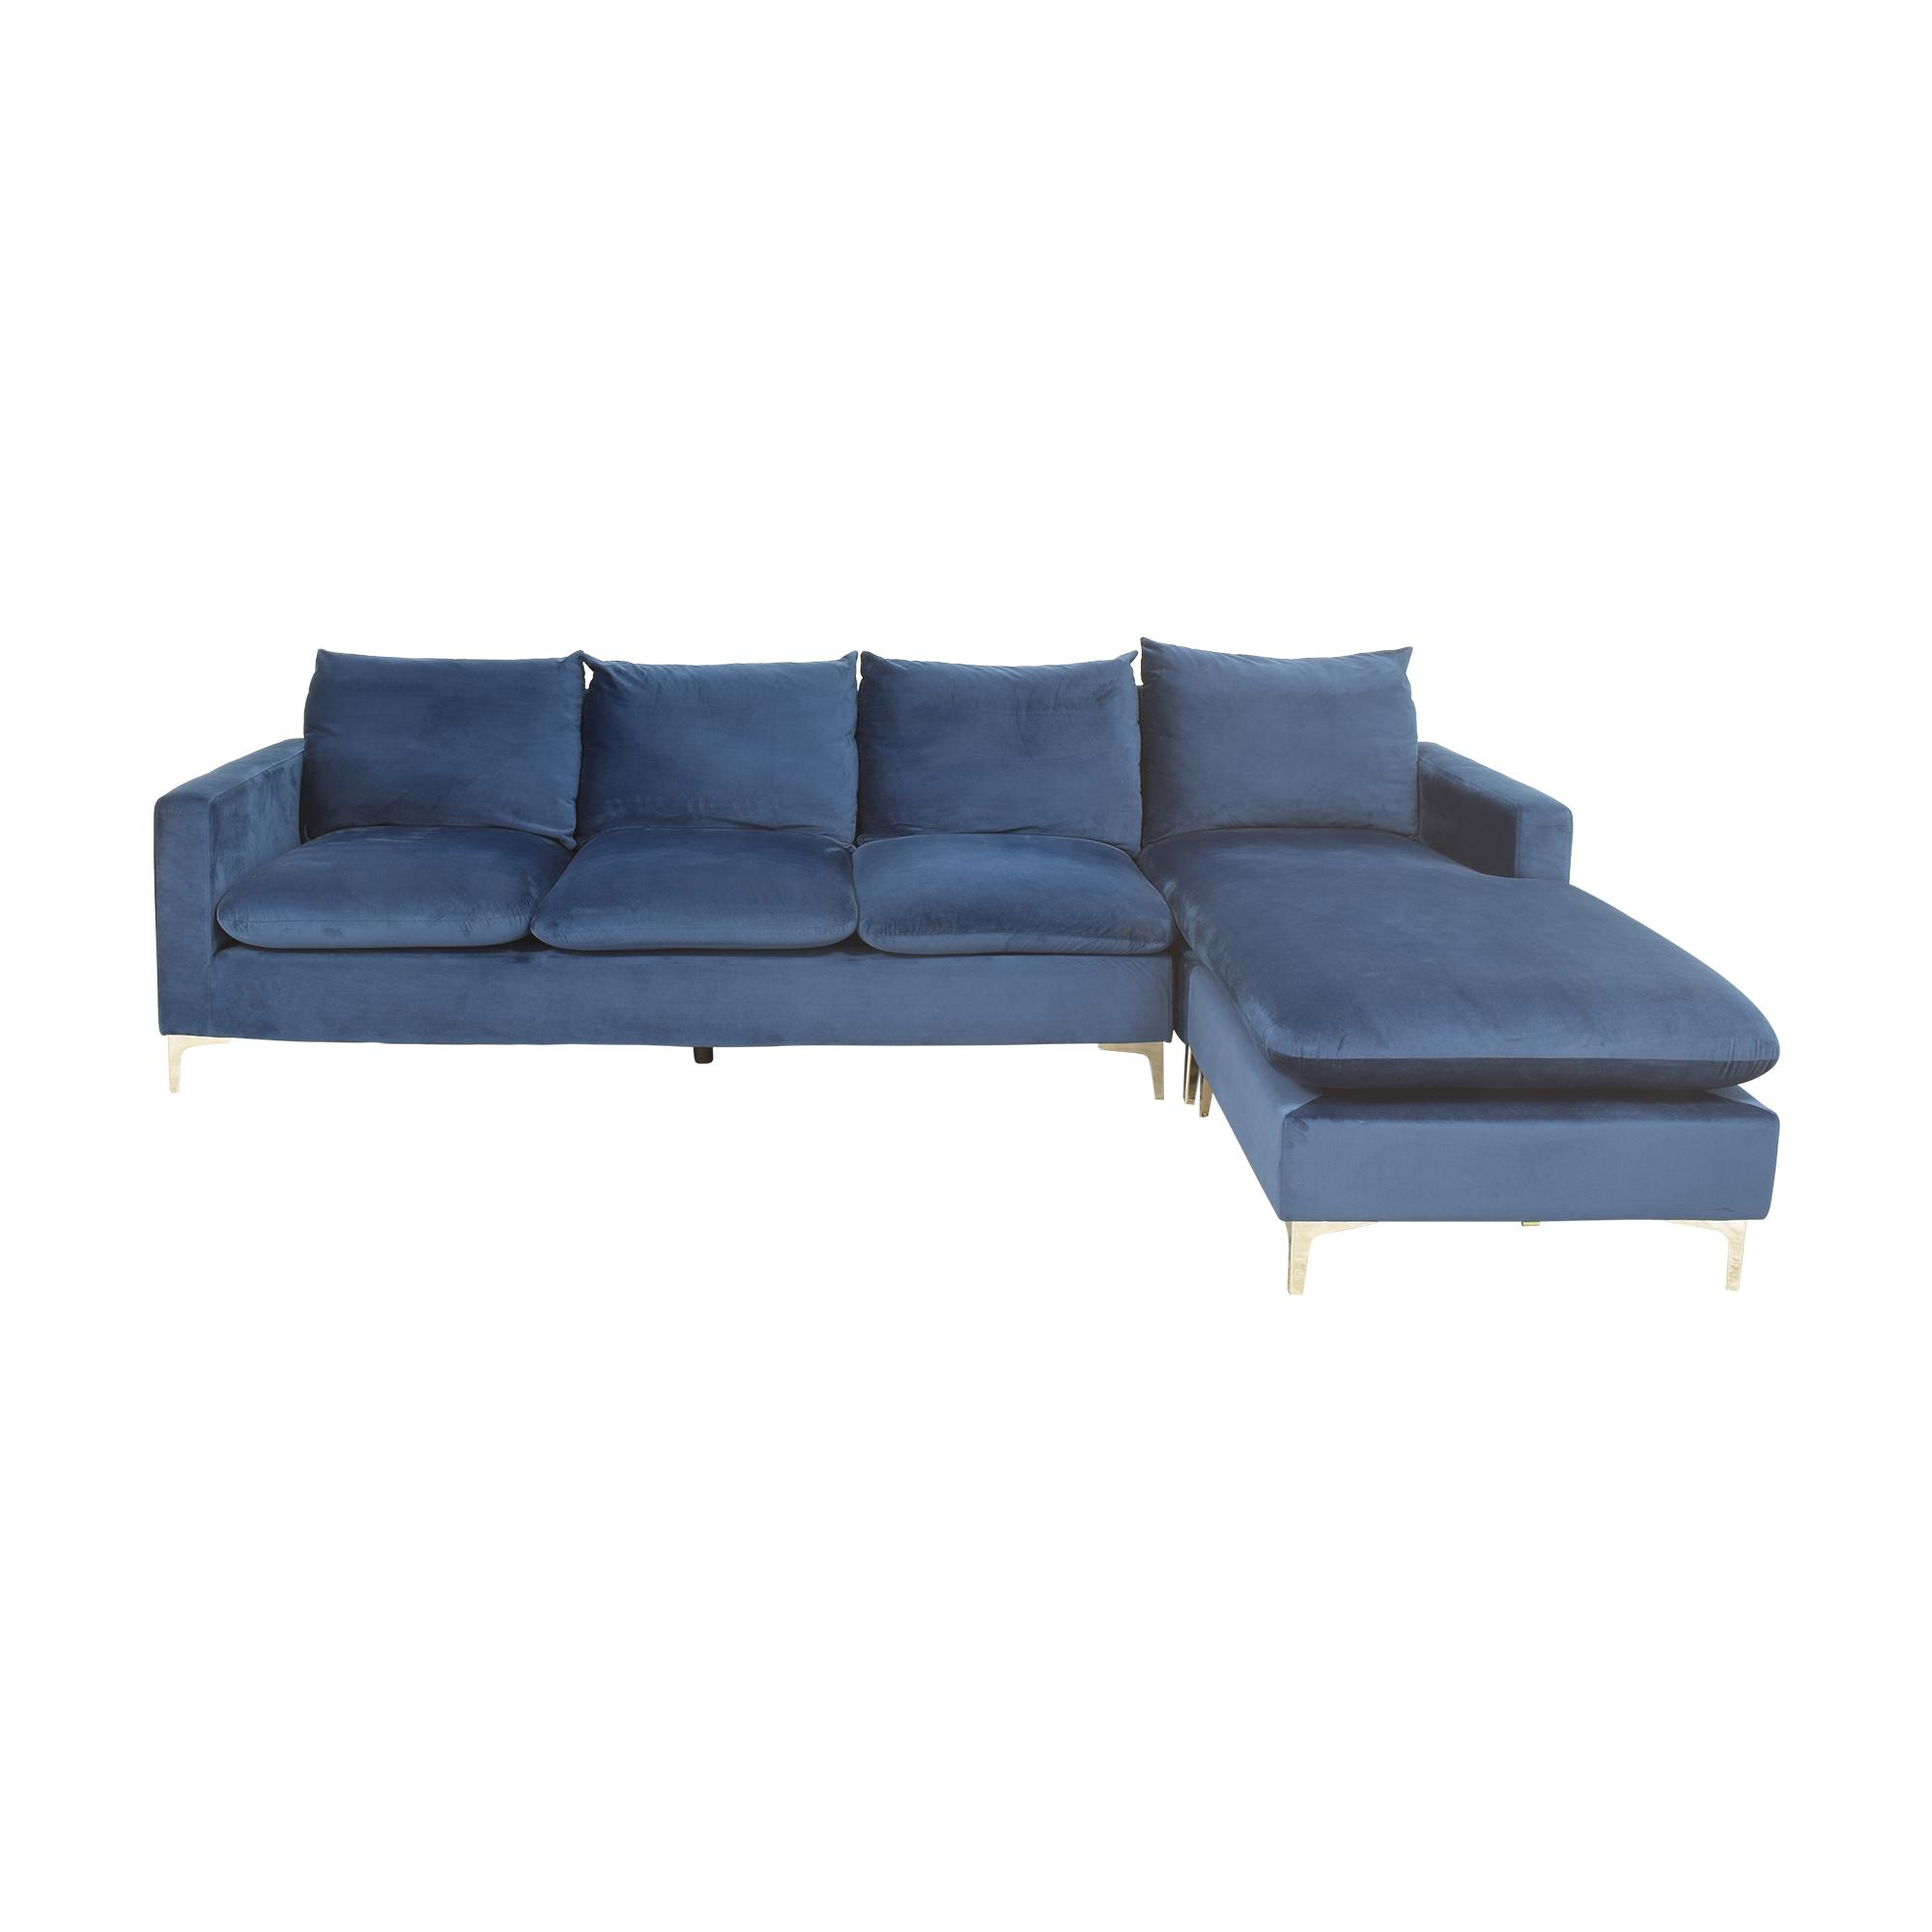 Wayfair Wayfair Boutwell Reversible Sectional Sofa Sofas